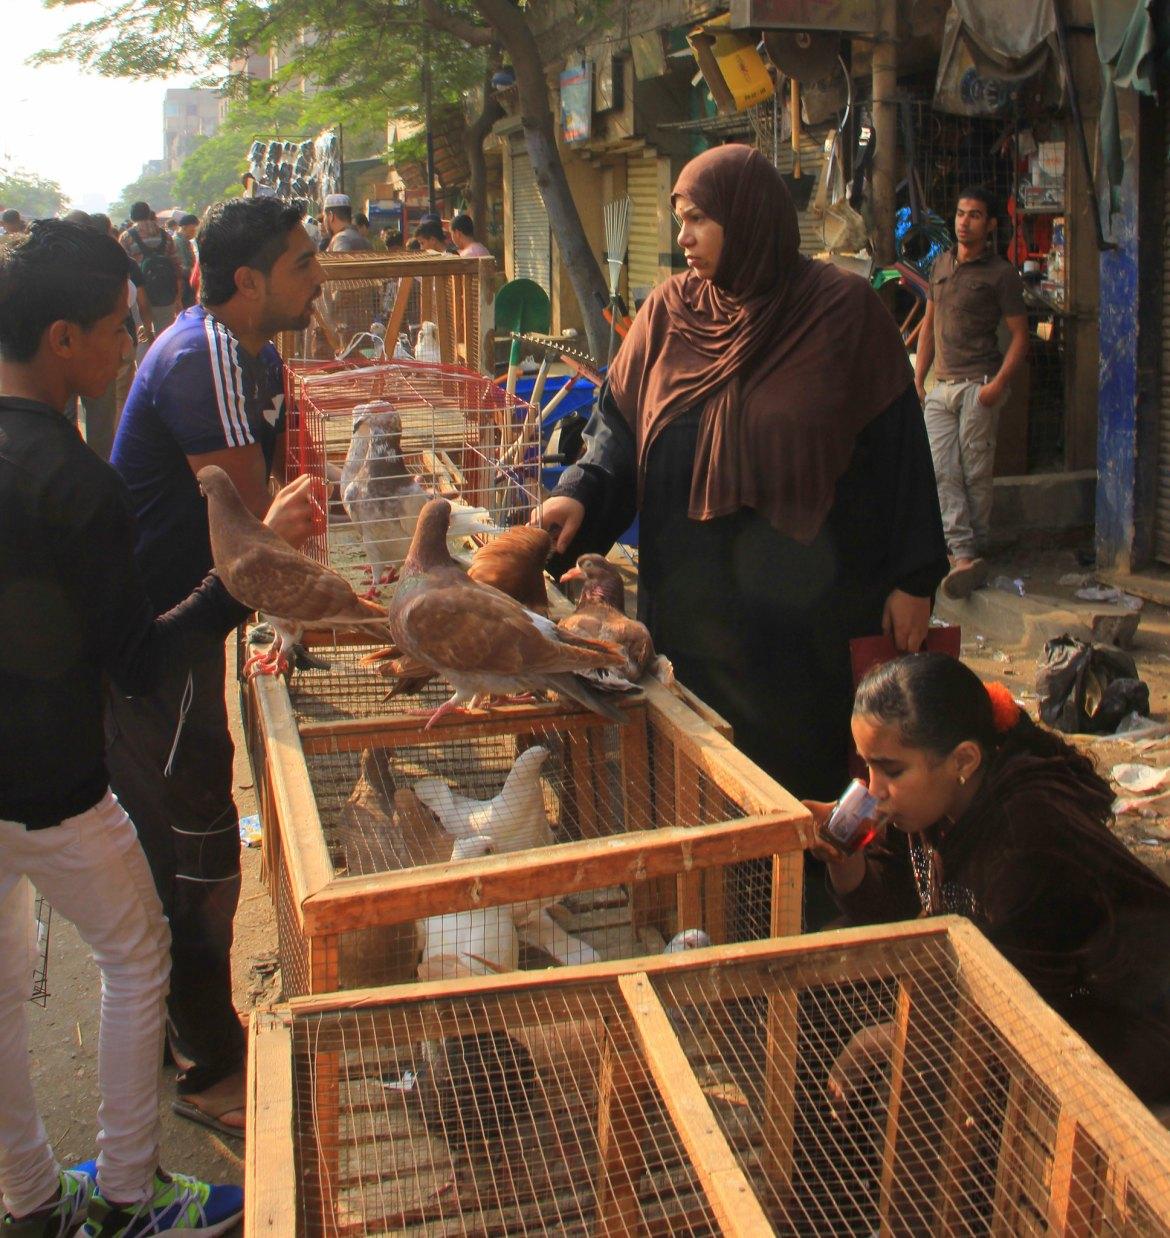 Animal seller at Souq al Goma